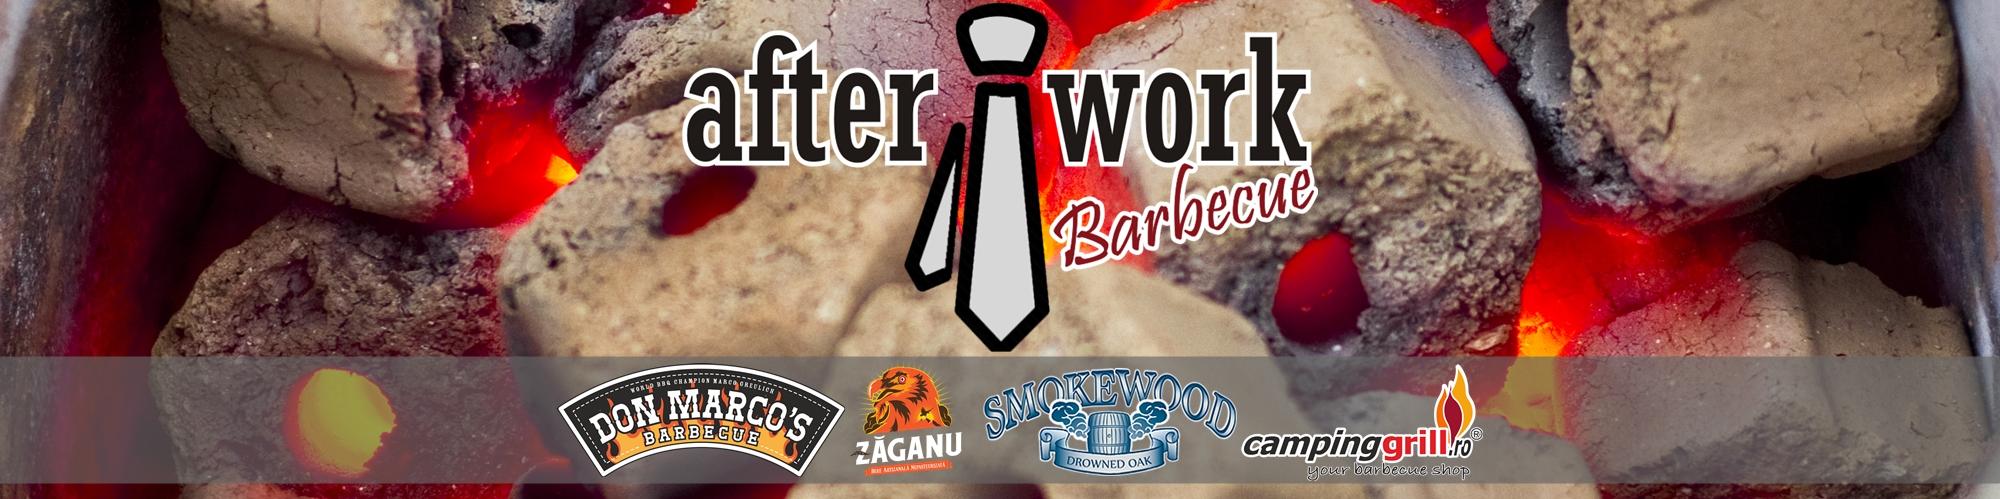 macheta-After-Work-BBQ_Grill-Society-2000x499_2016-06-14-1